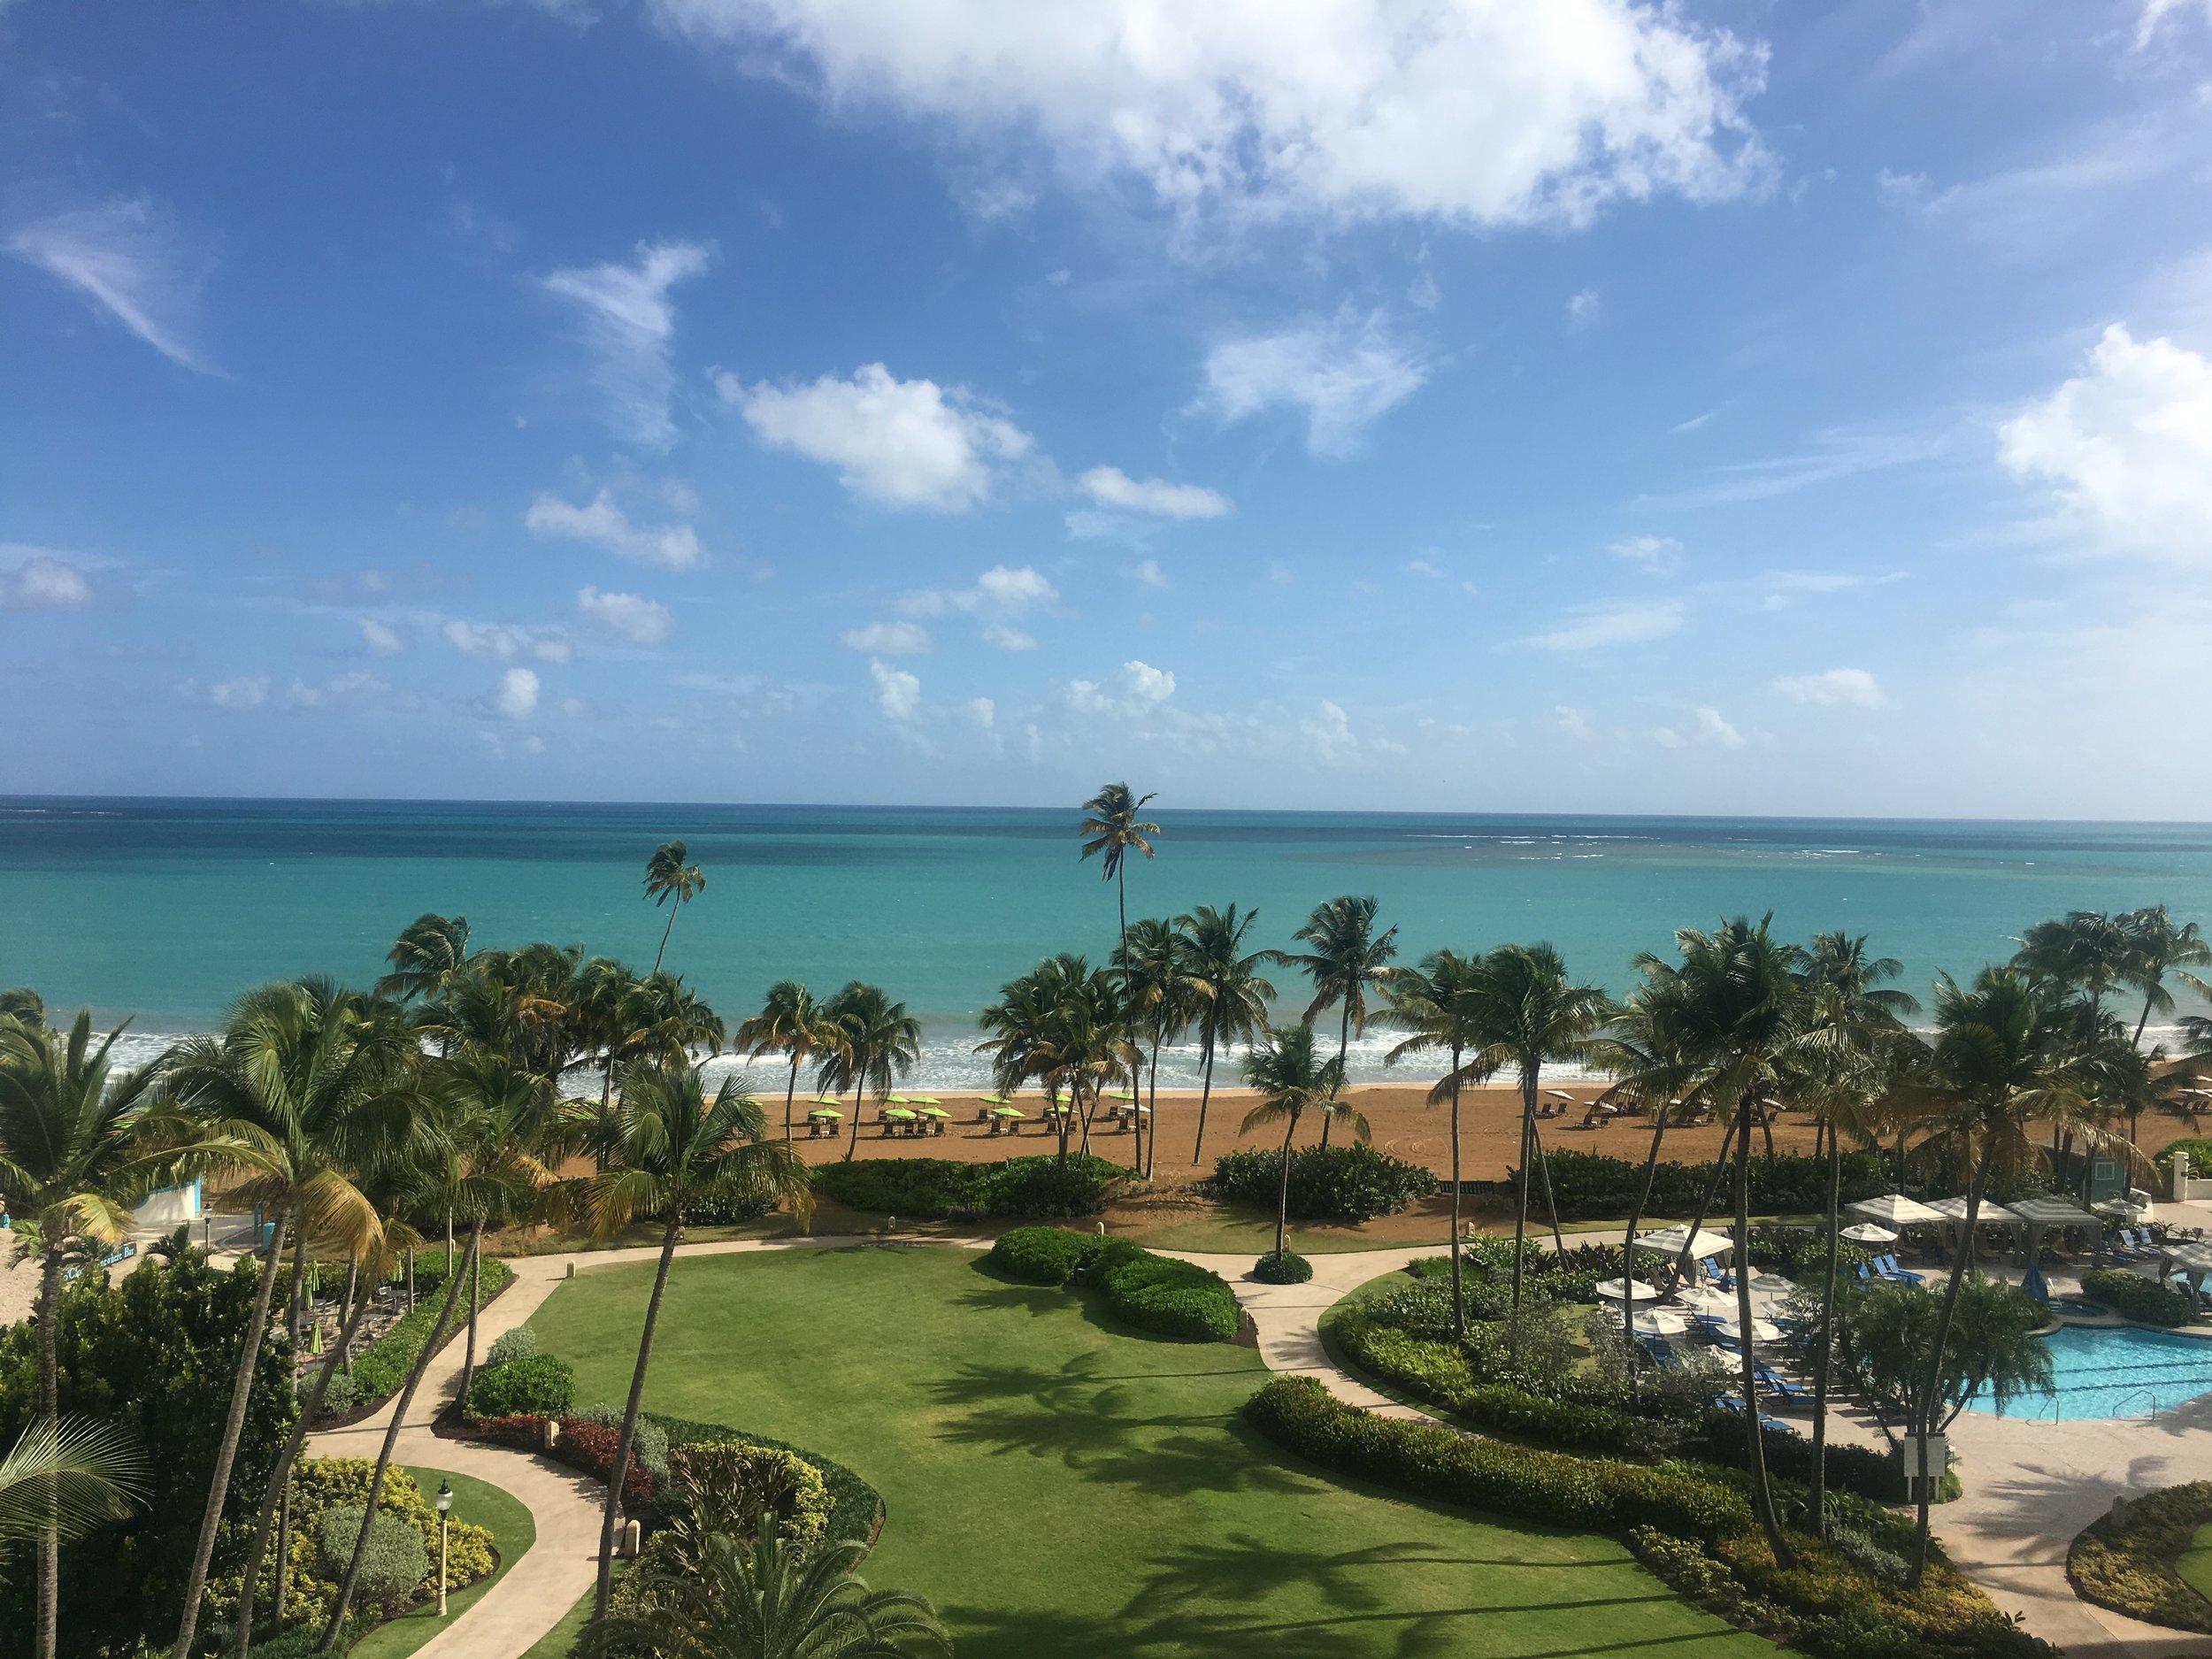 Wyndham Grand Rio Mar Puerto Rico Ocean View Room.JPG